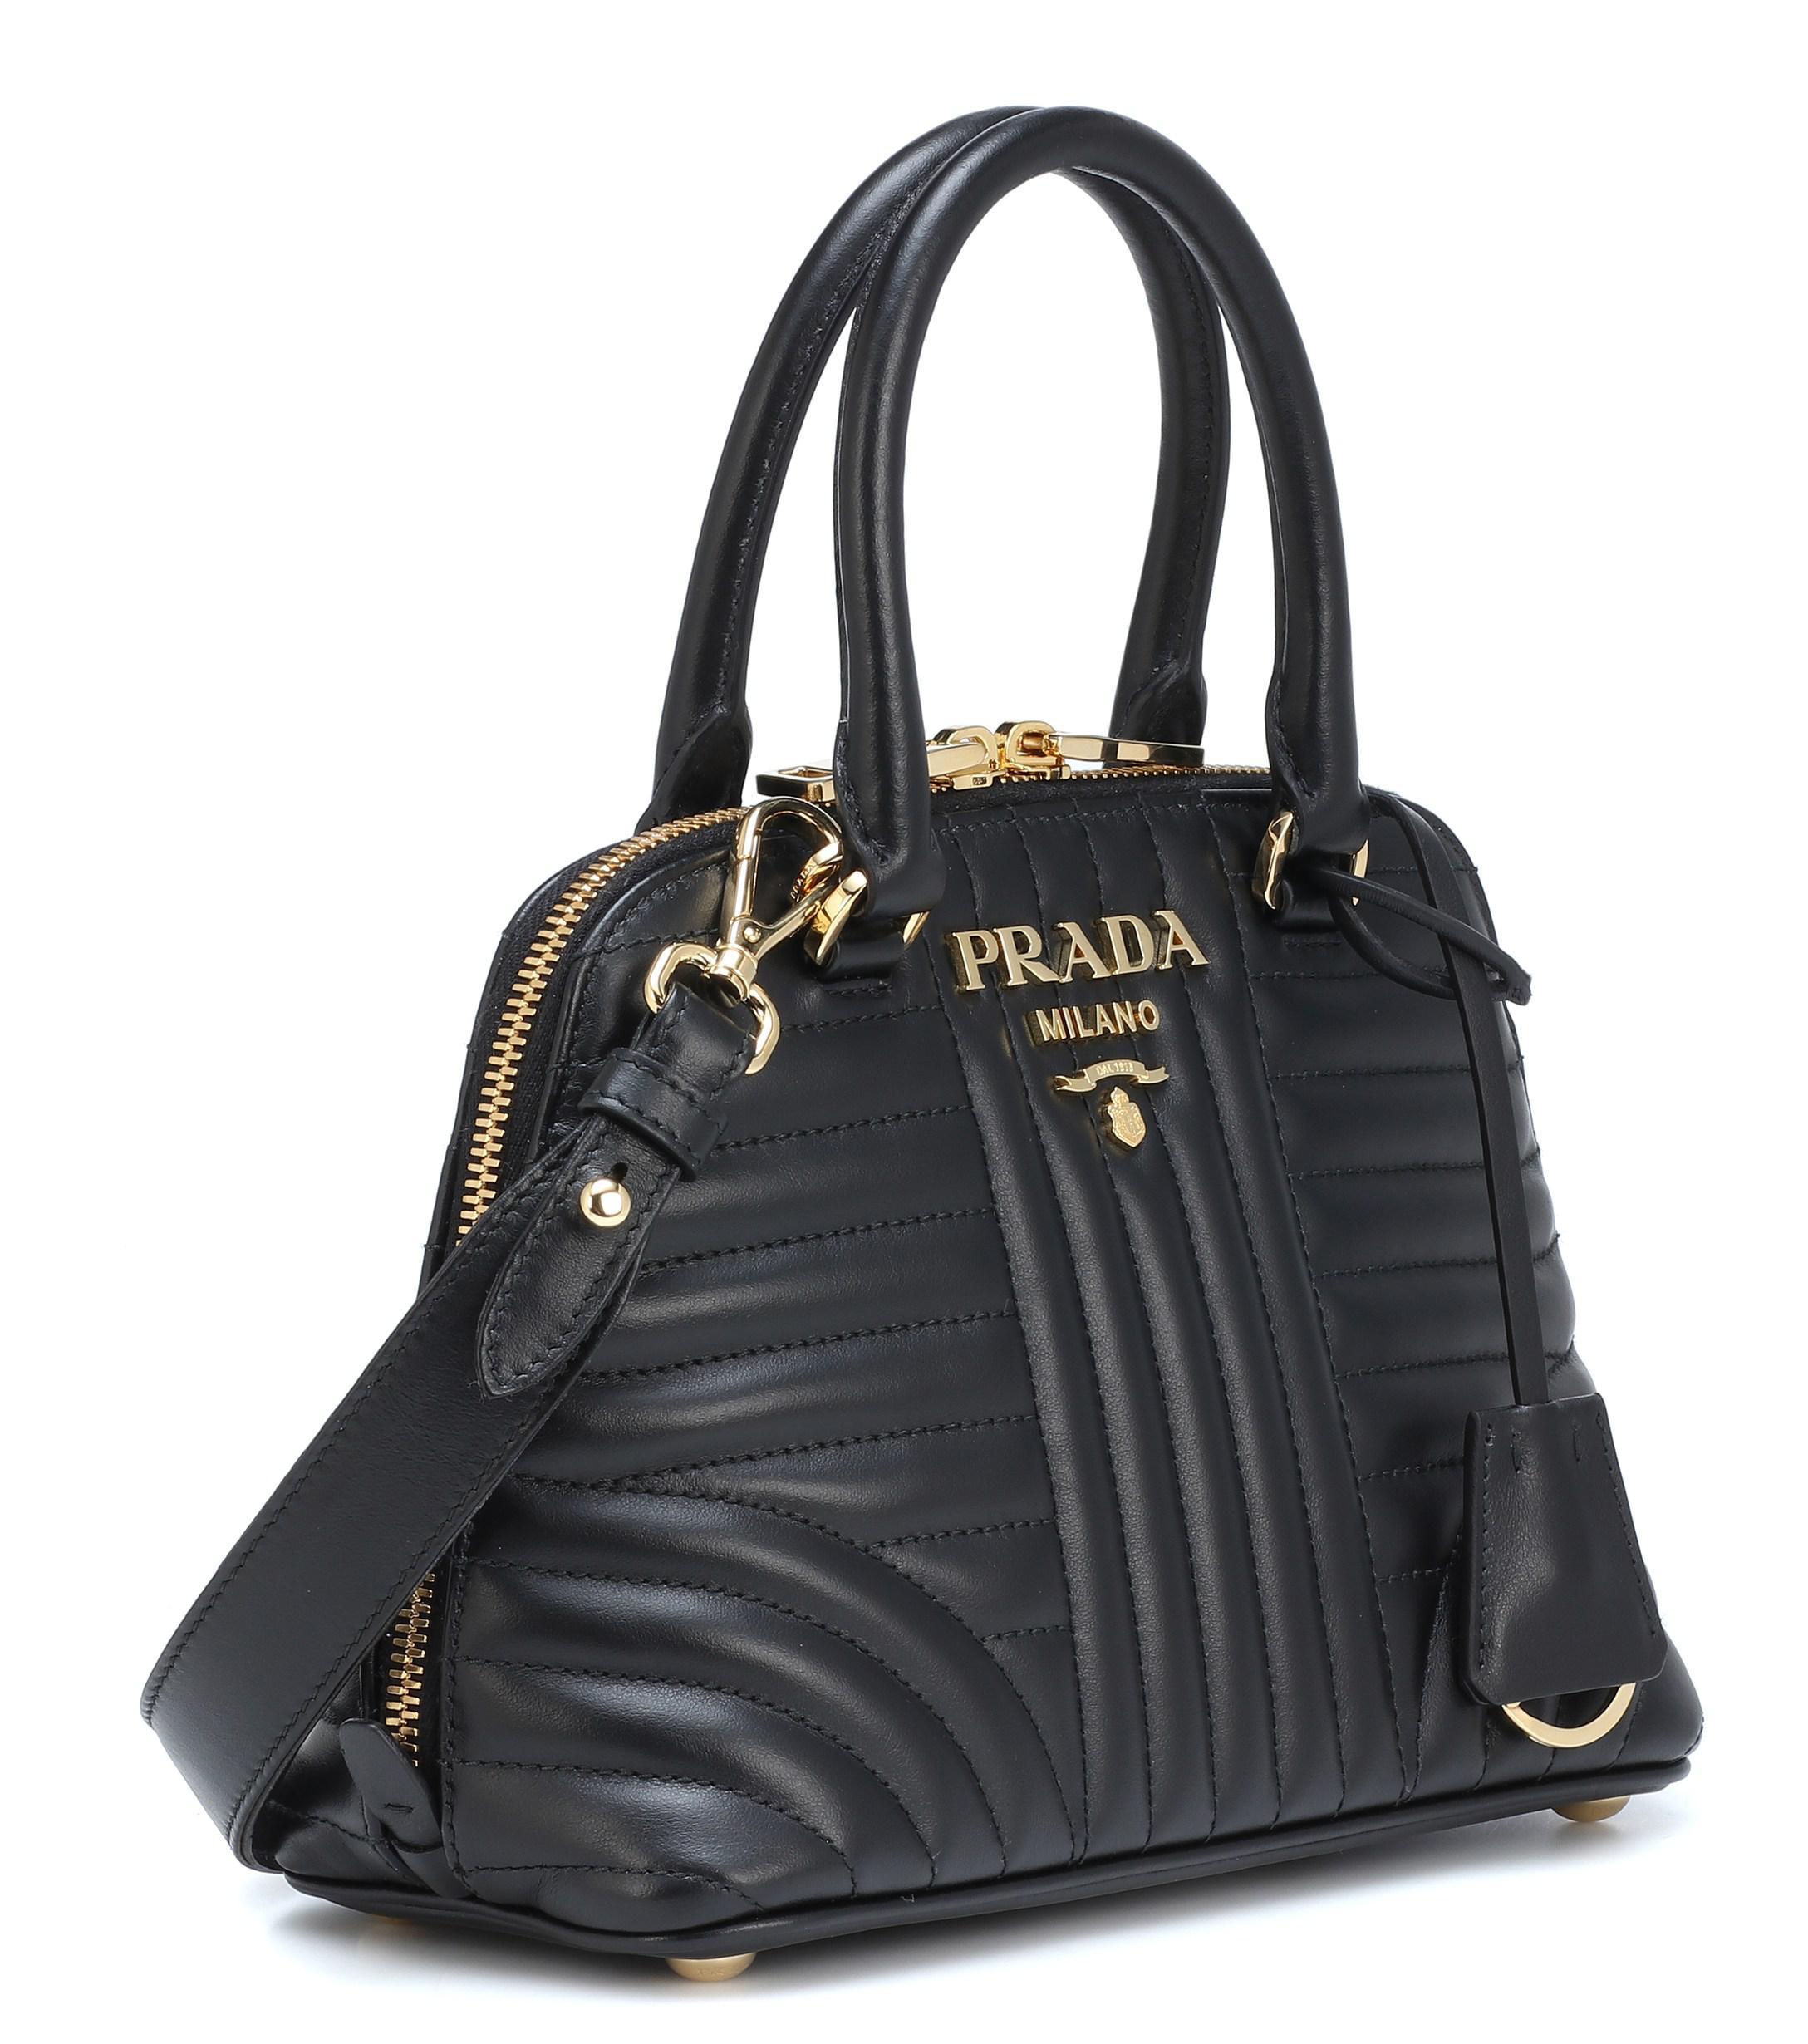 aa1bd4a5ef74 australia prada clutch bag man 8ff3e 9cedc; new zealand lyst prada  matelassé leather shoulder bag in black b66a1 d4a6e